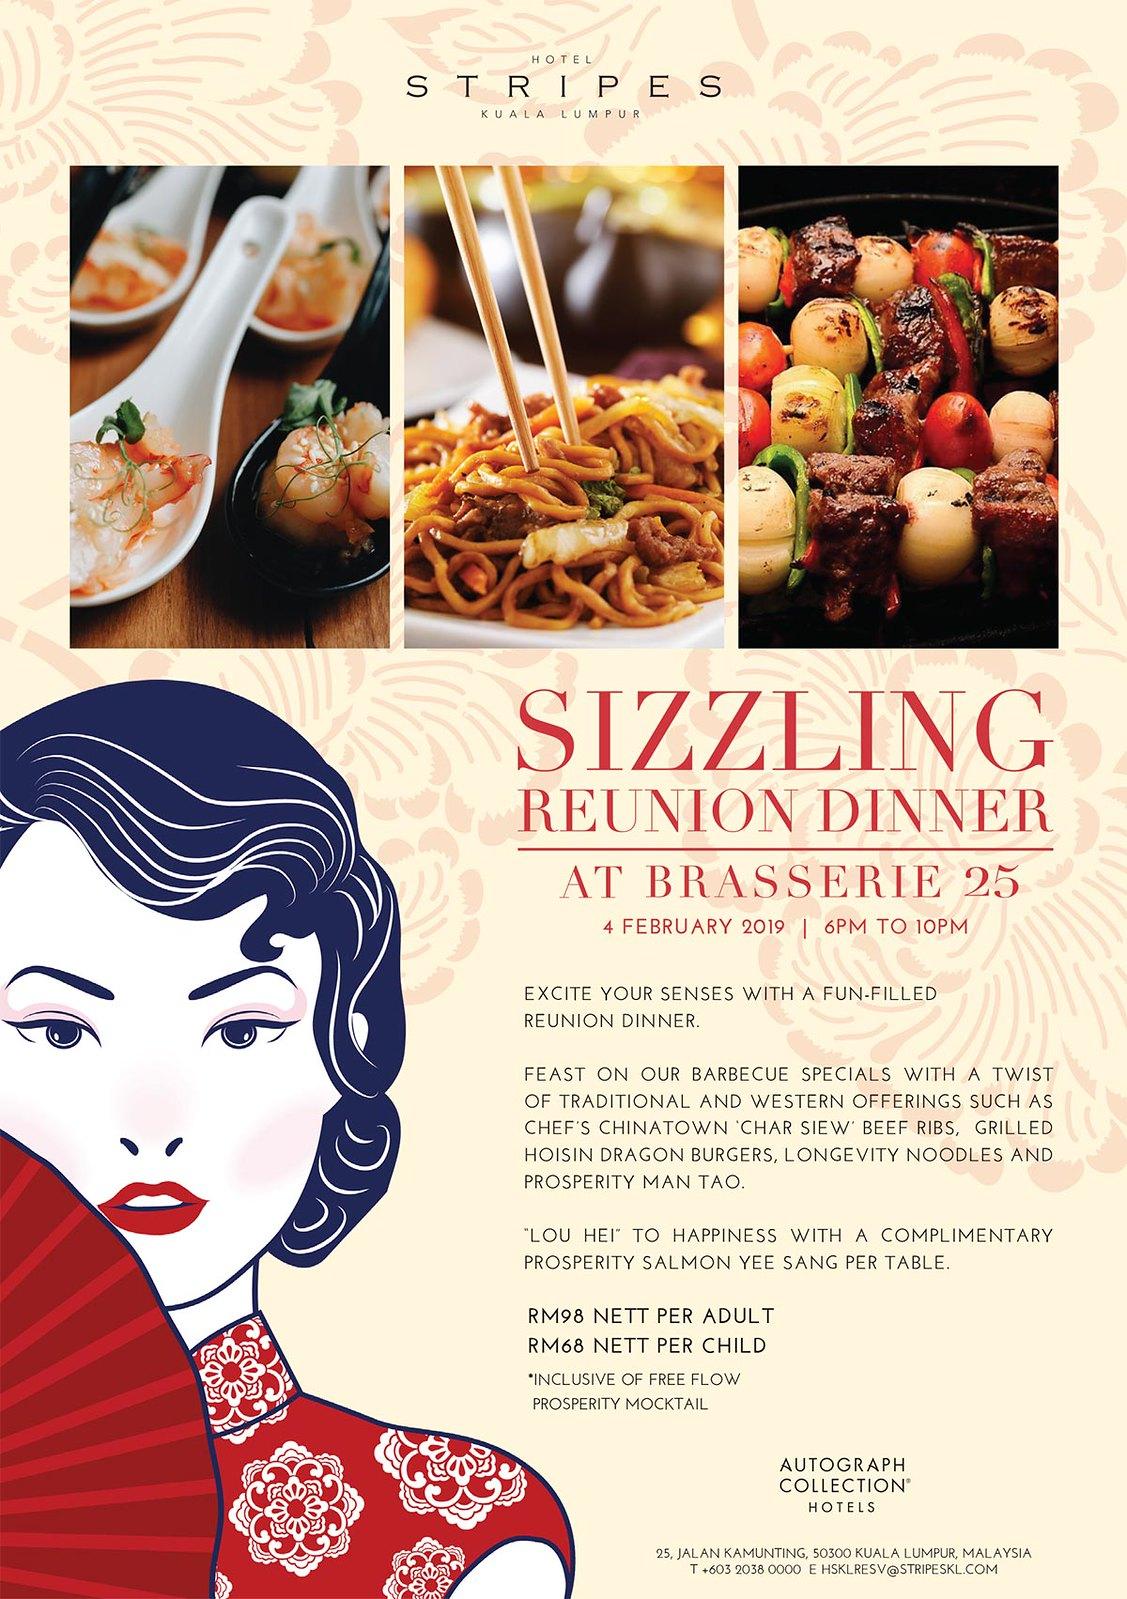 Sizzling-Reunion-Dinner-(Brasserie-25)